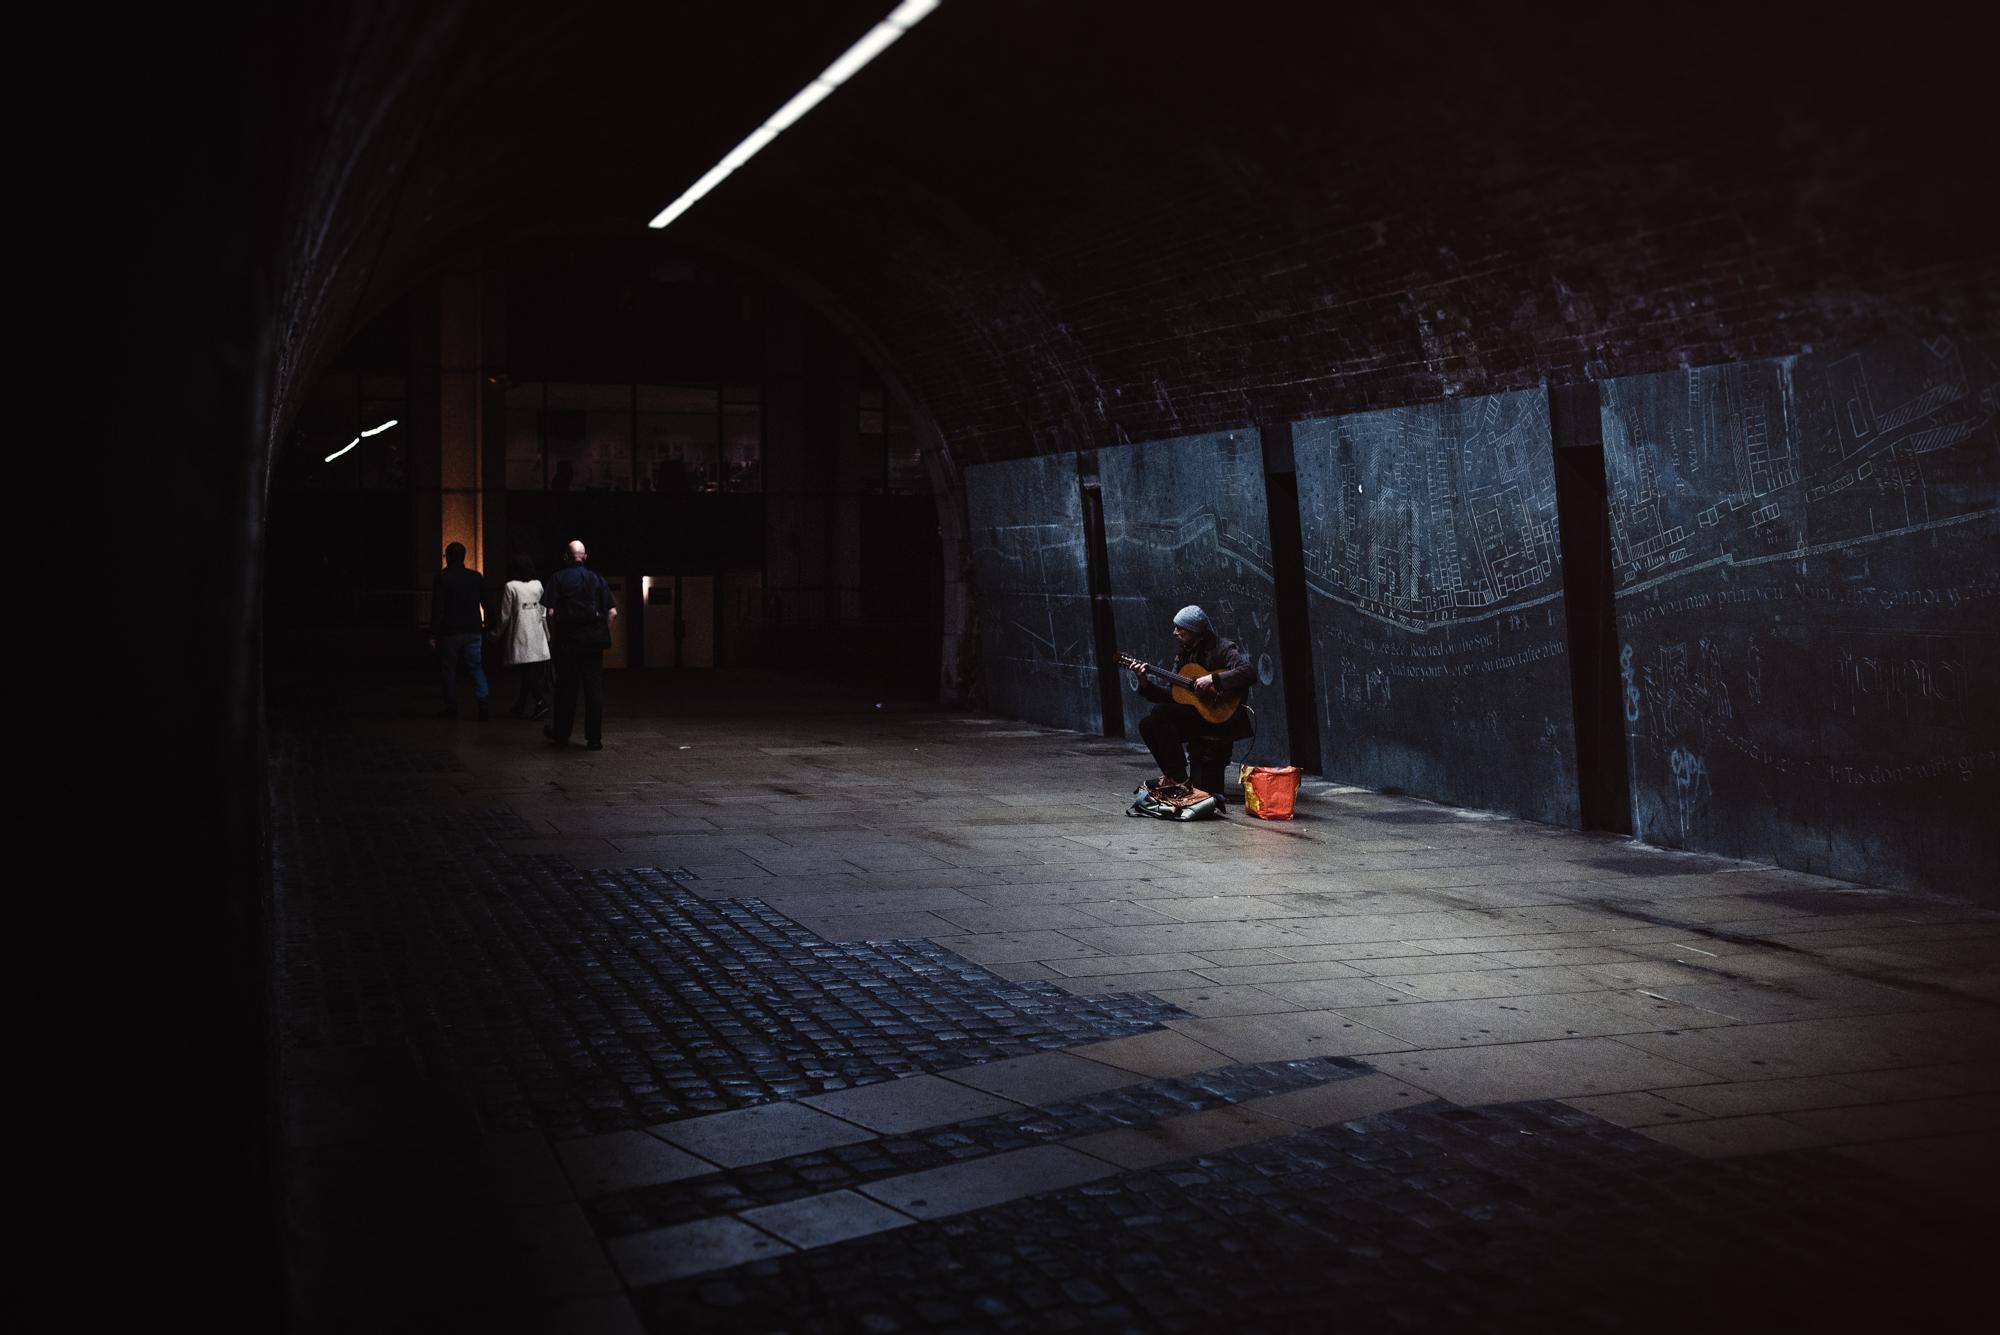 London street photography night